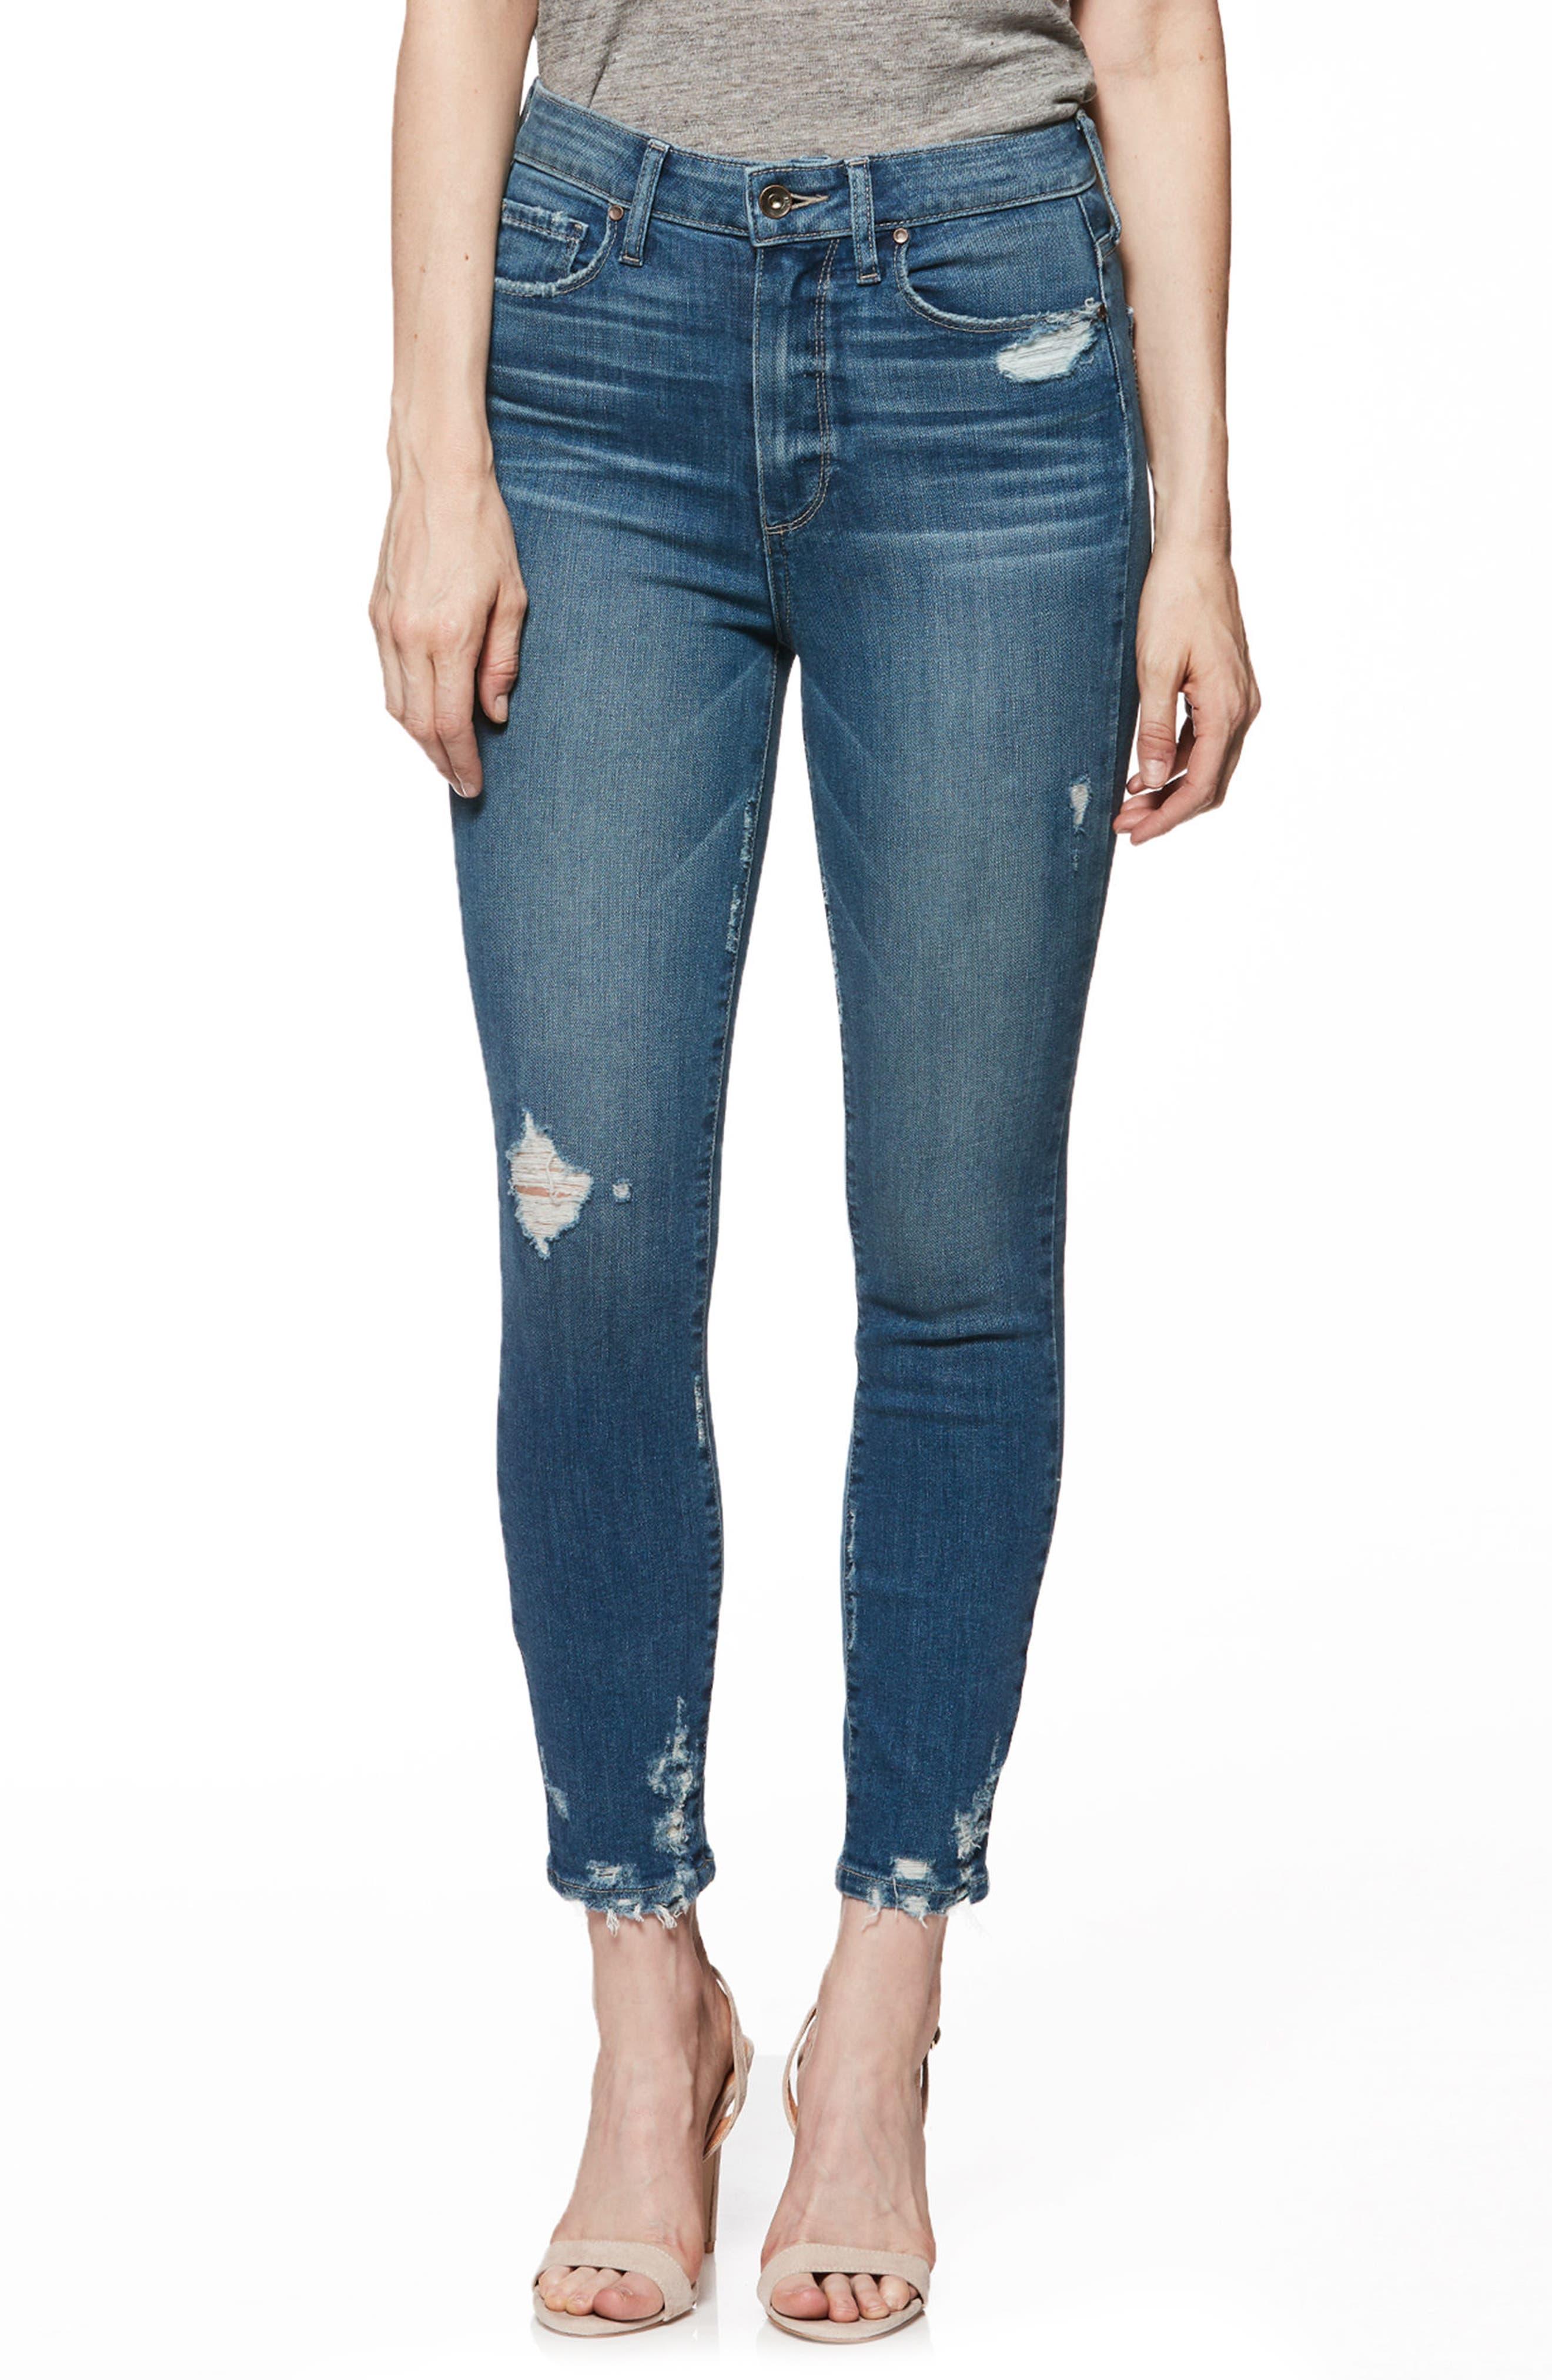 Transcend Vintage - Margot High Waist Crop Skinny Jeans,                             Main thumbnail 1, color,                             Ashby Destructed